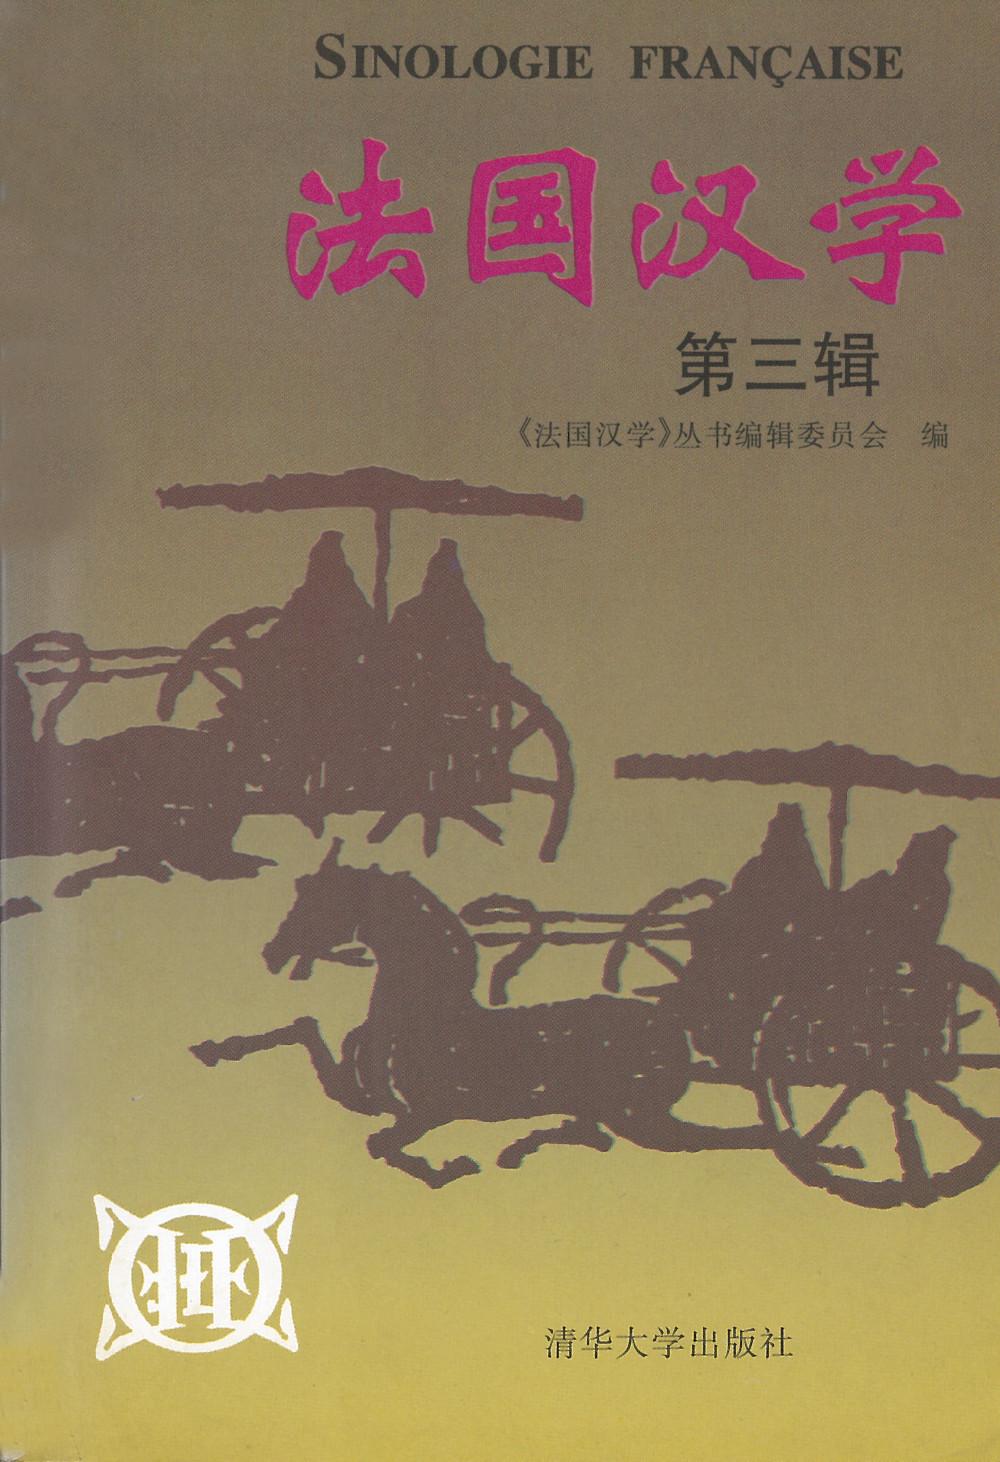 Faguo Hanxue [Sinologie française] 3